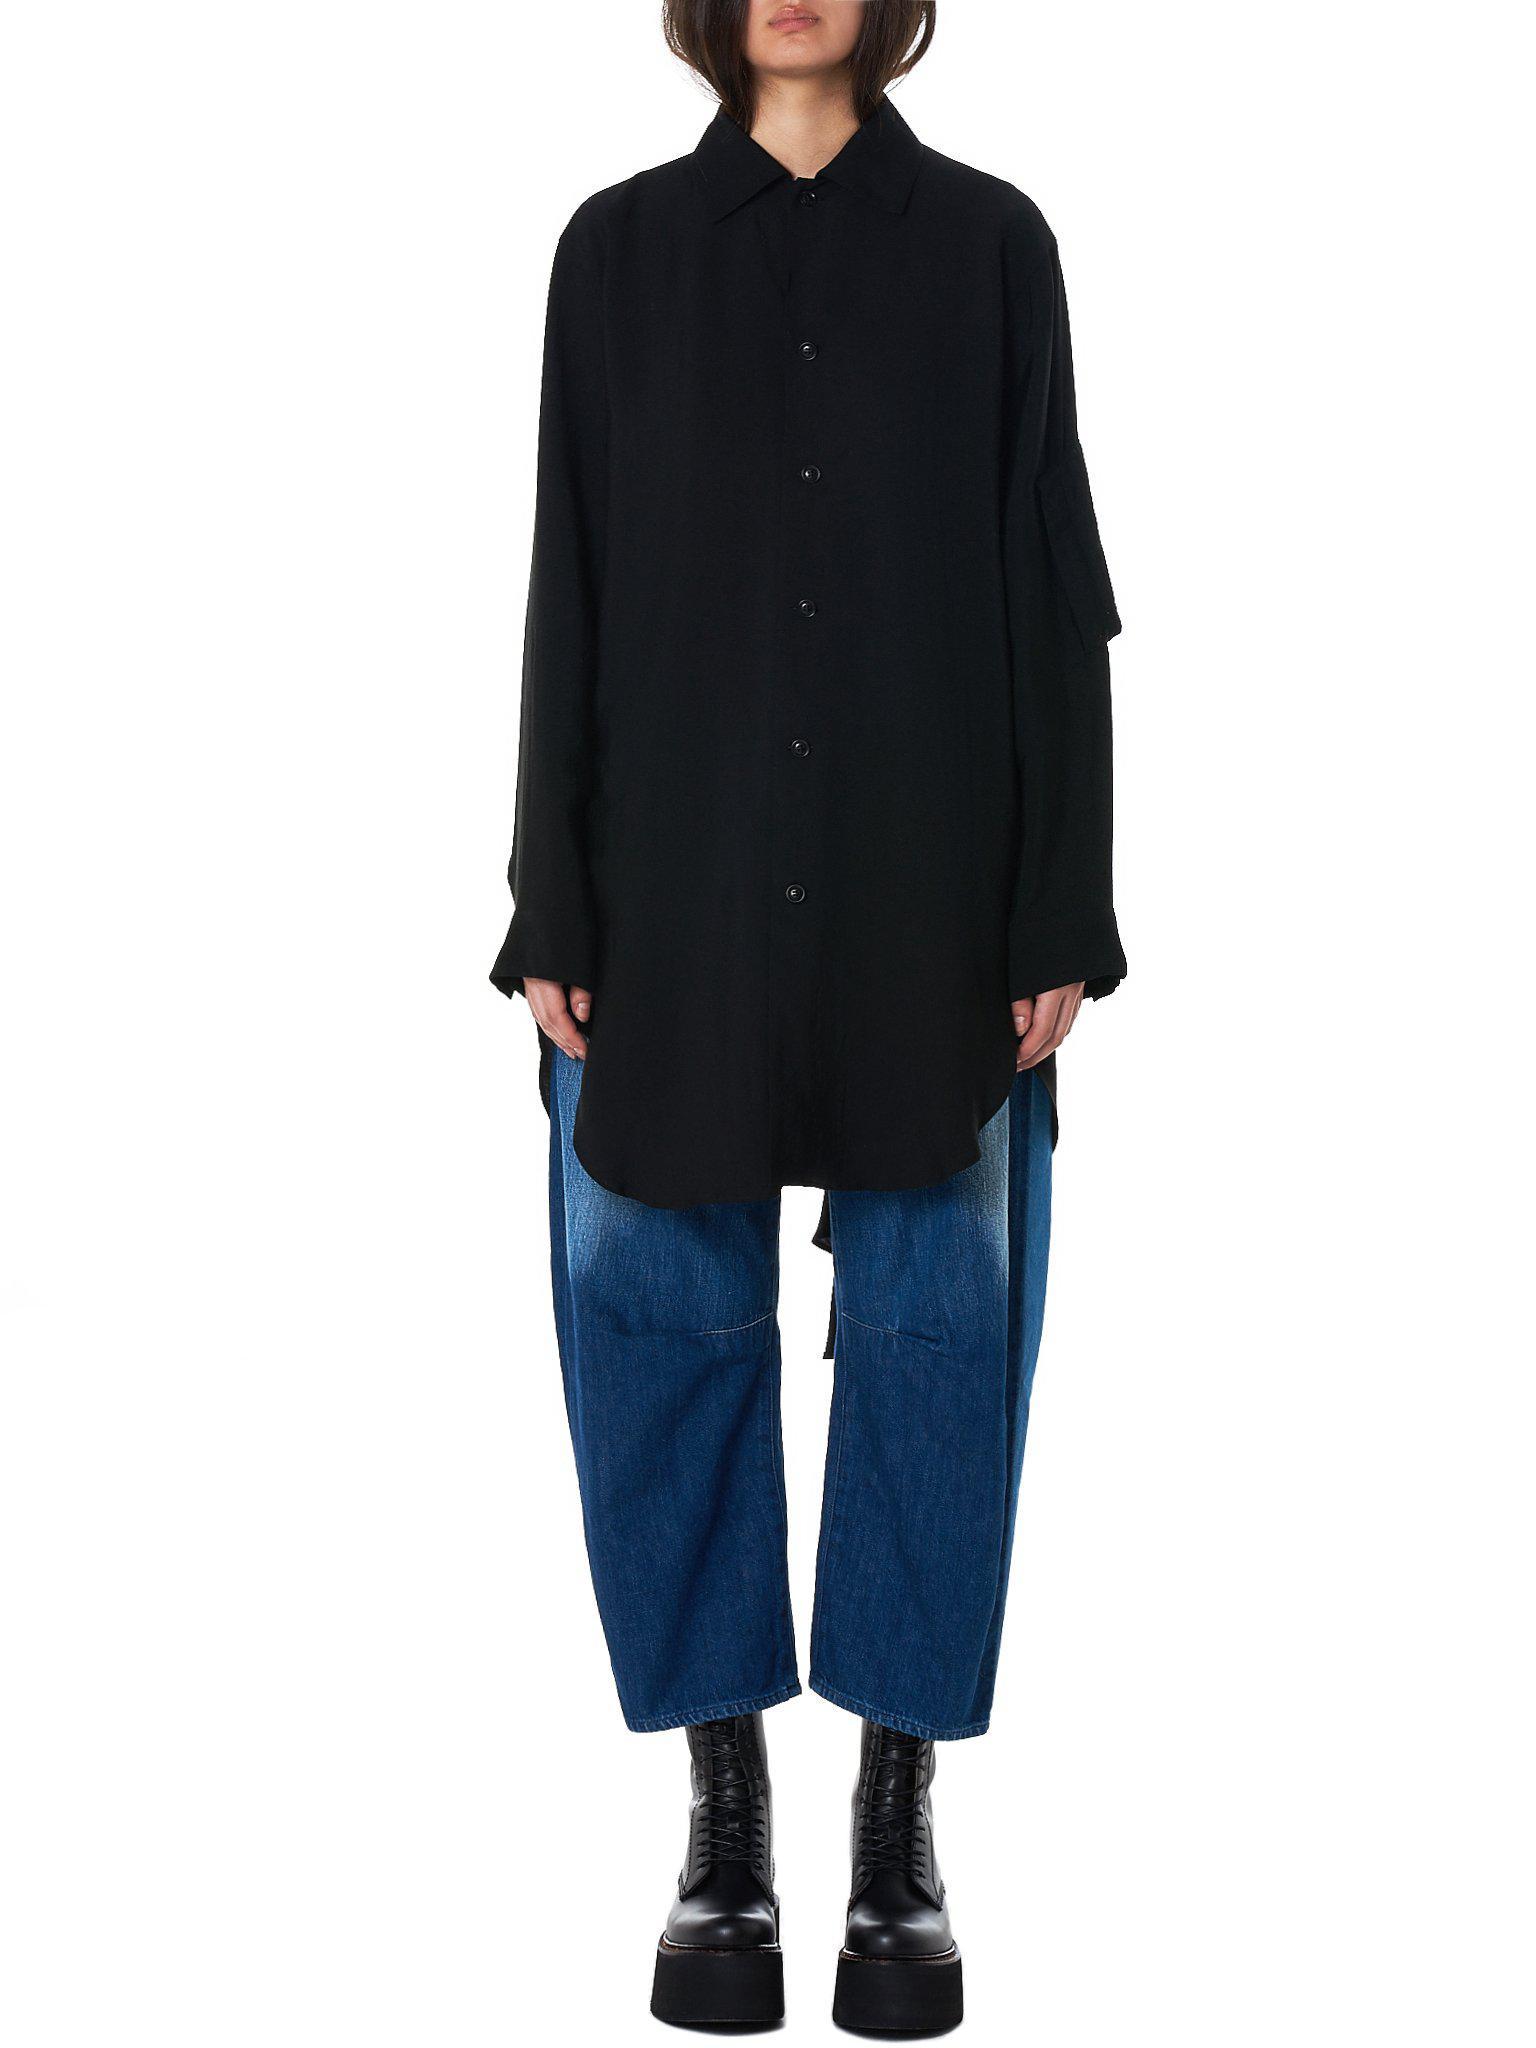 Lyst - Y S Yohji Yamamoto Draped Shirt in Black 1f13c33208